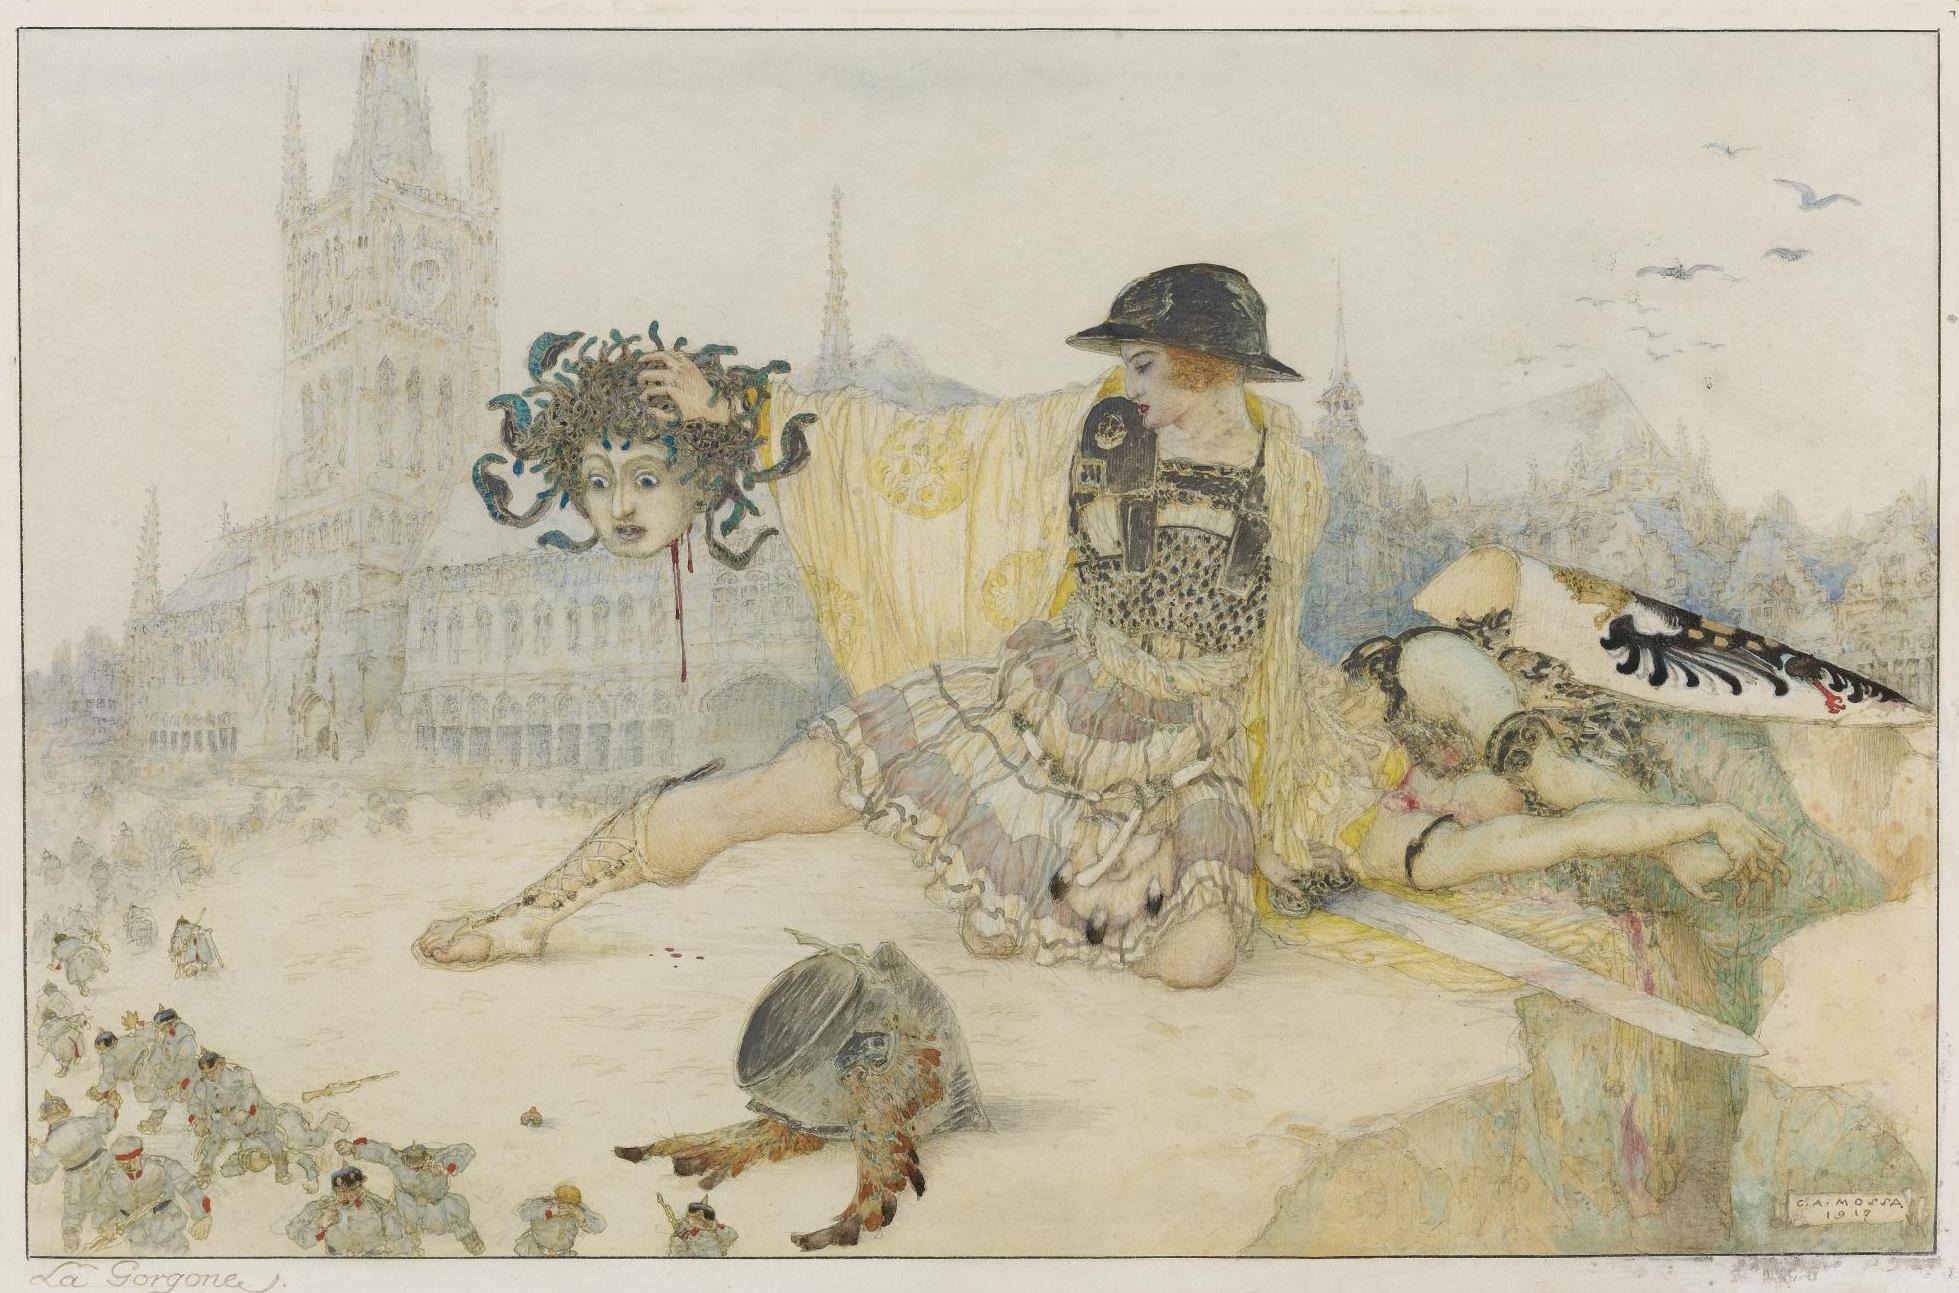 Gustav-Adolf Mossa, l'ultimo dei Simbolisti